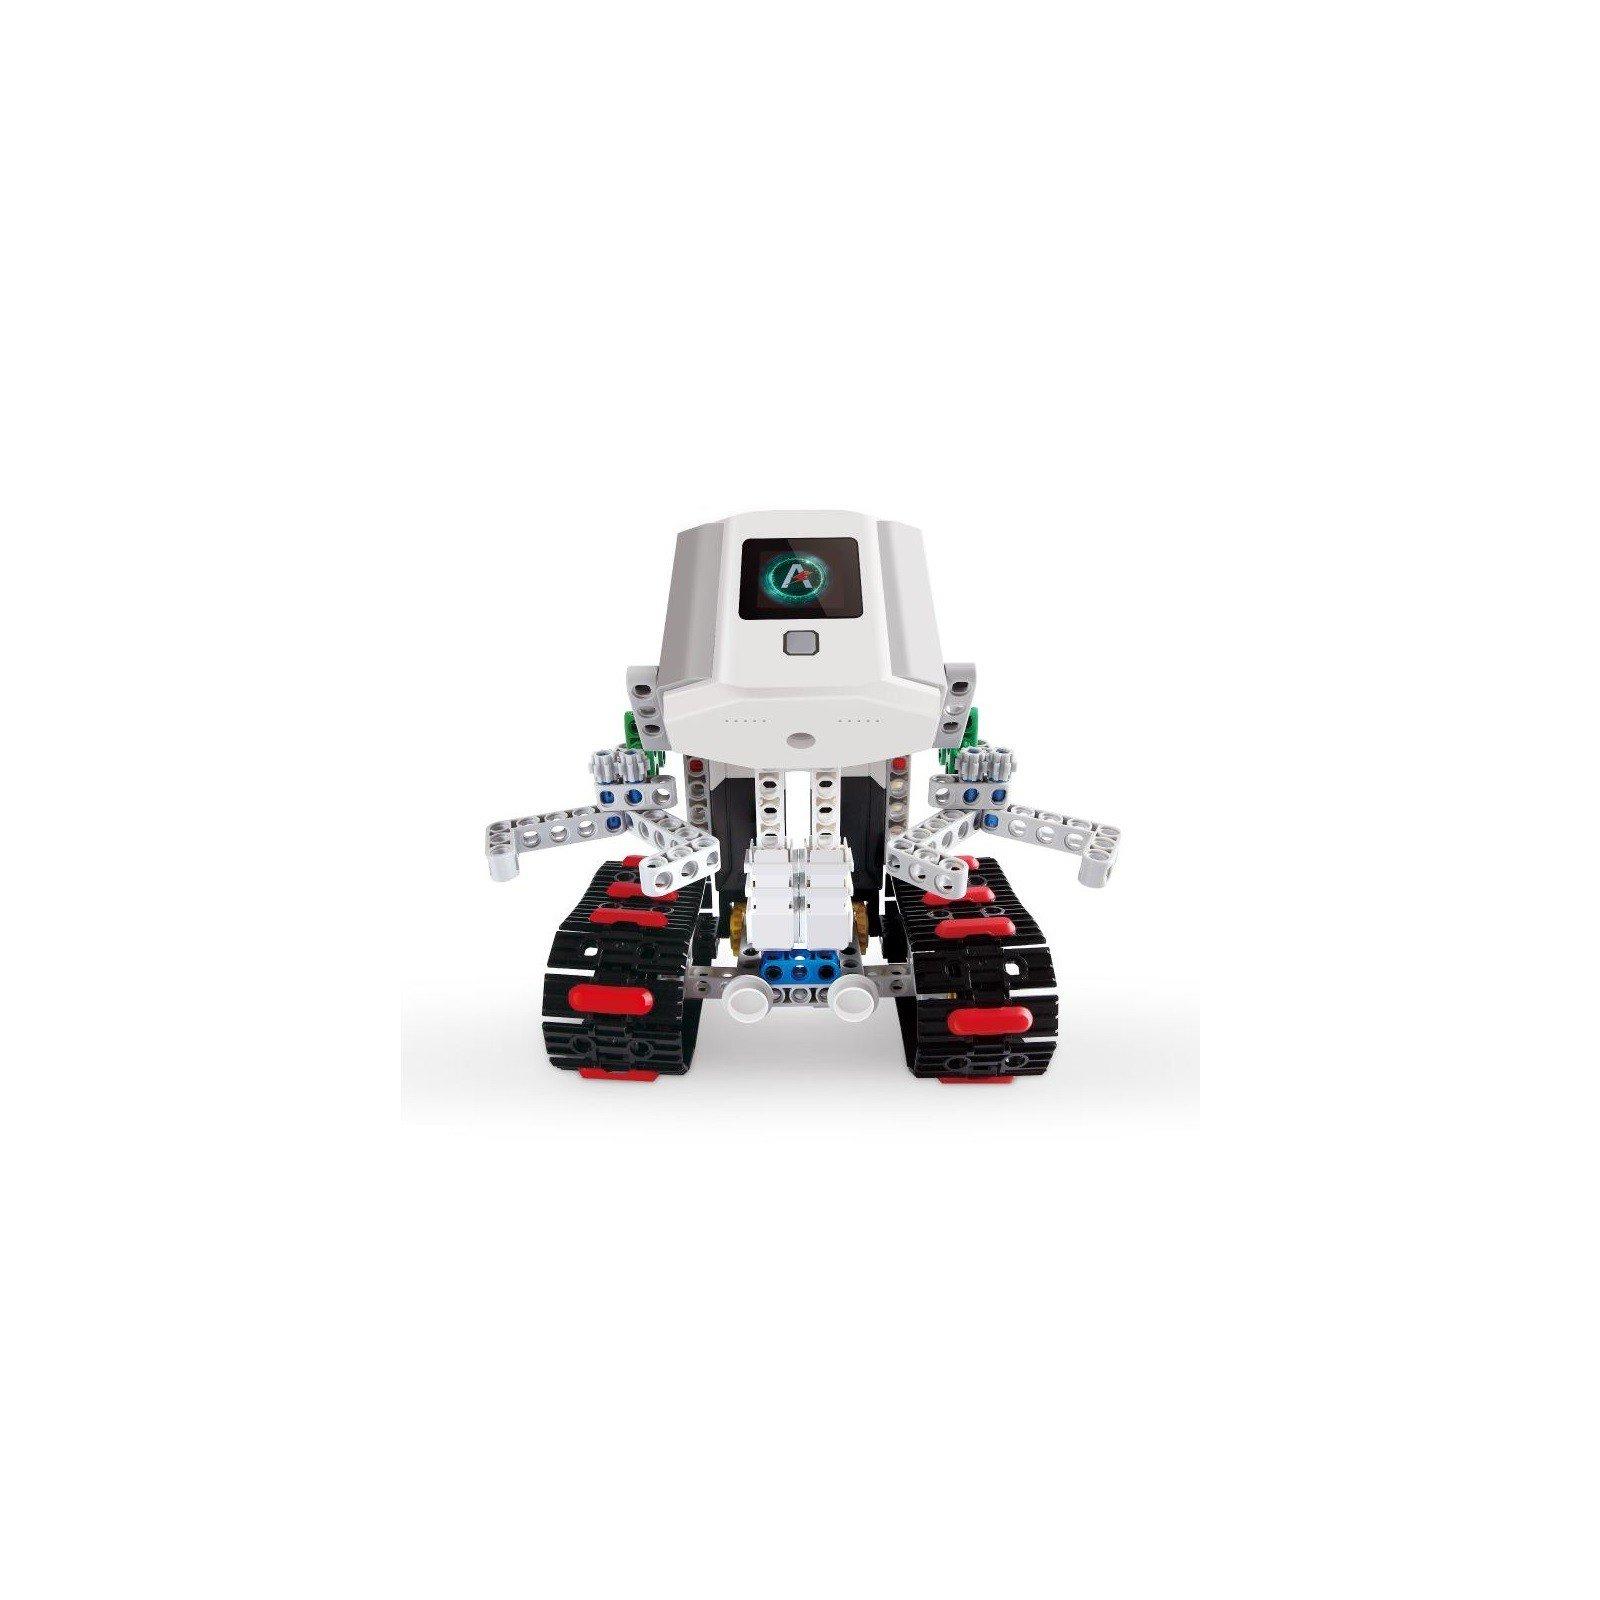 Робот Abilix Krypton 4 (Krypton_4)